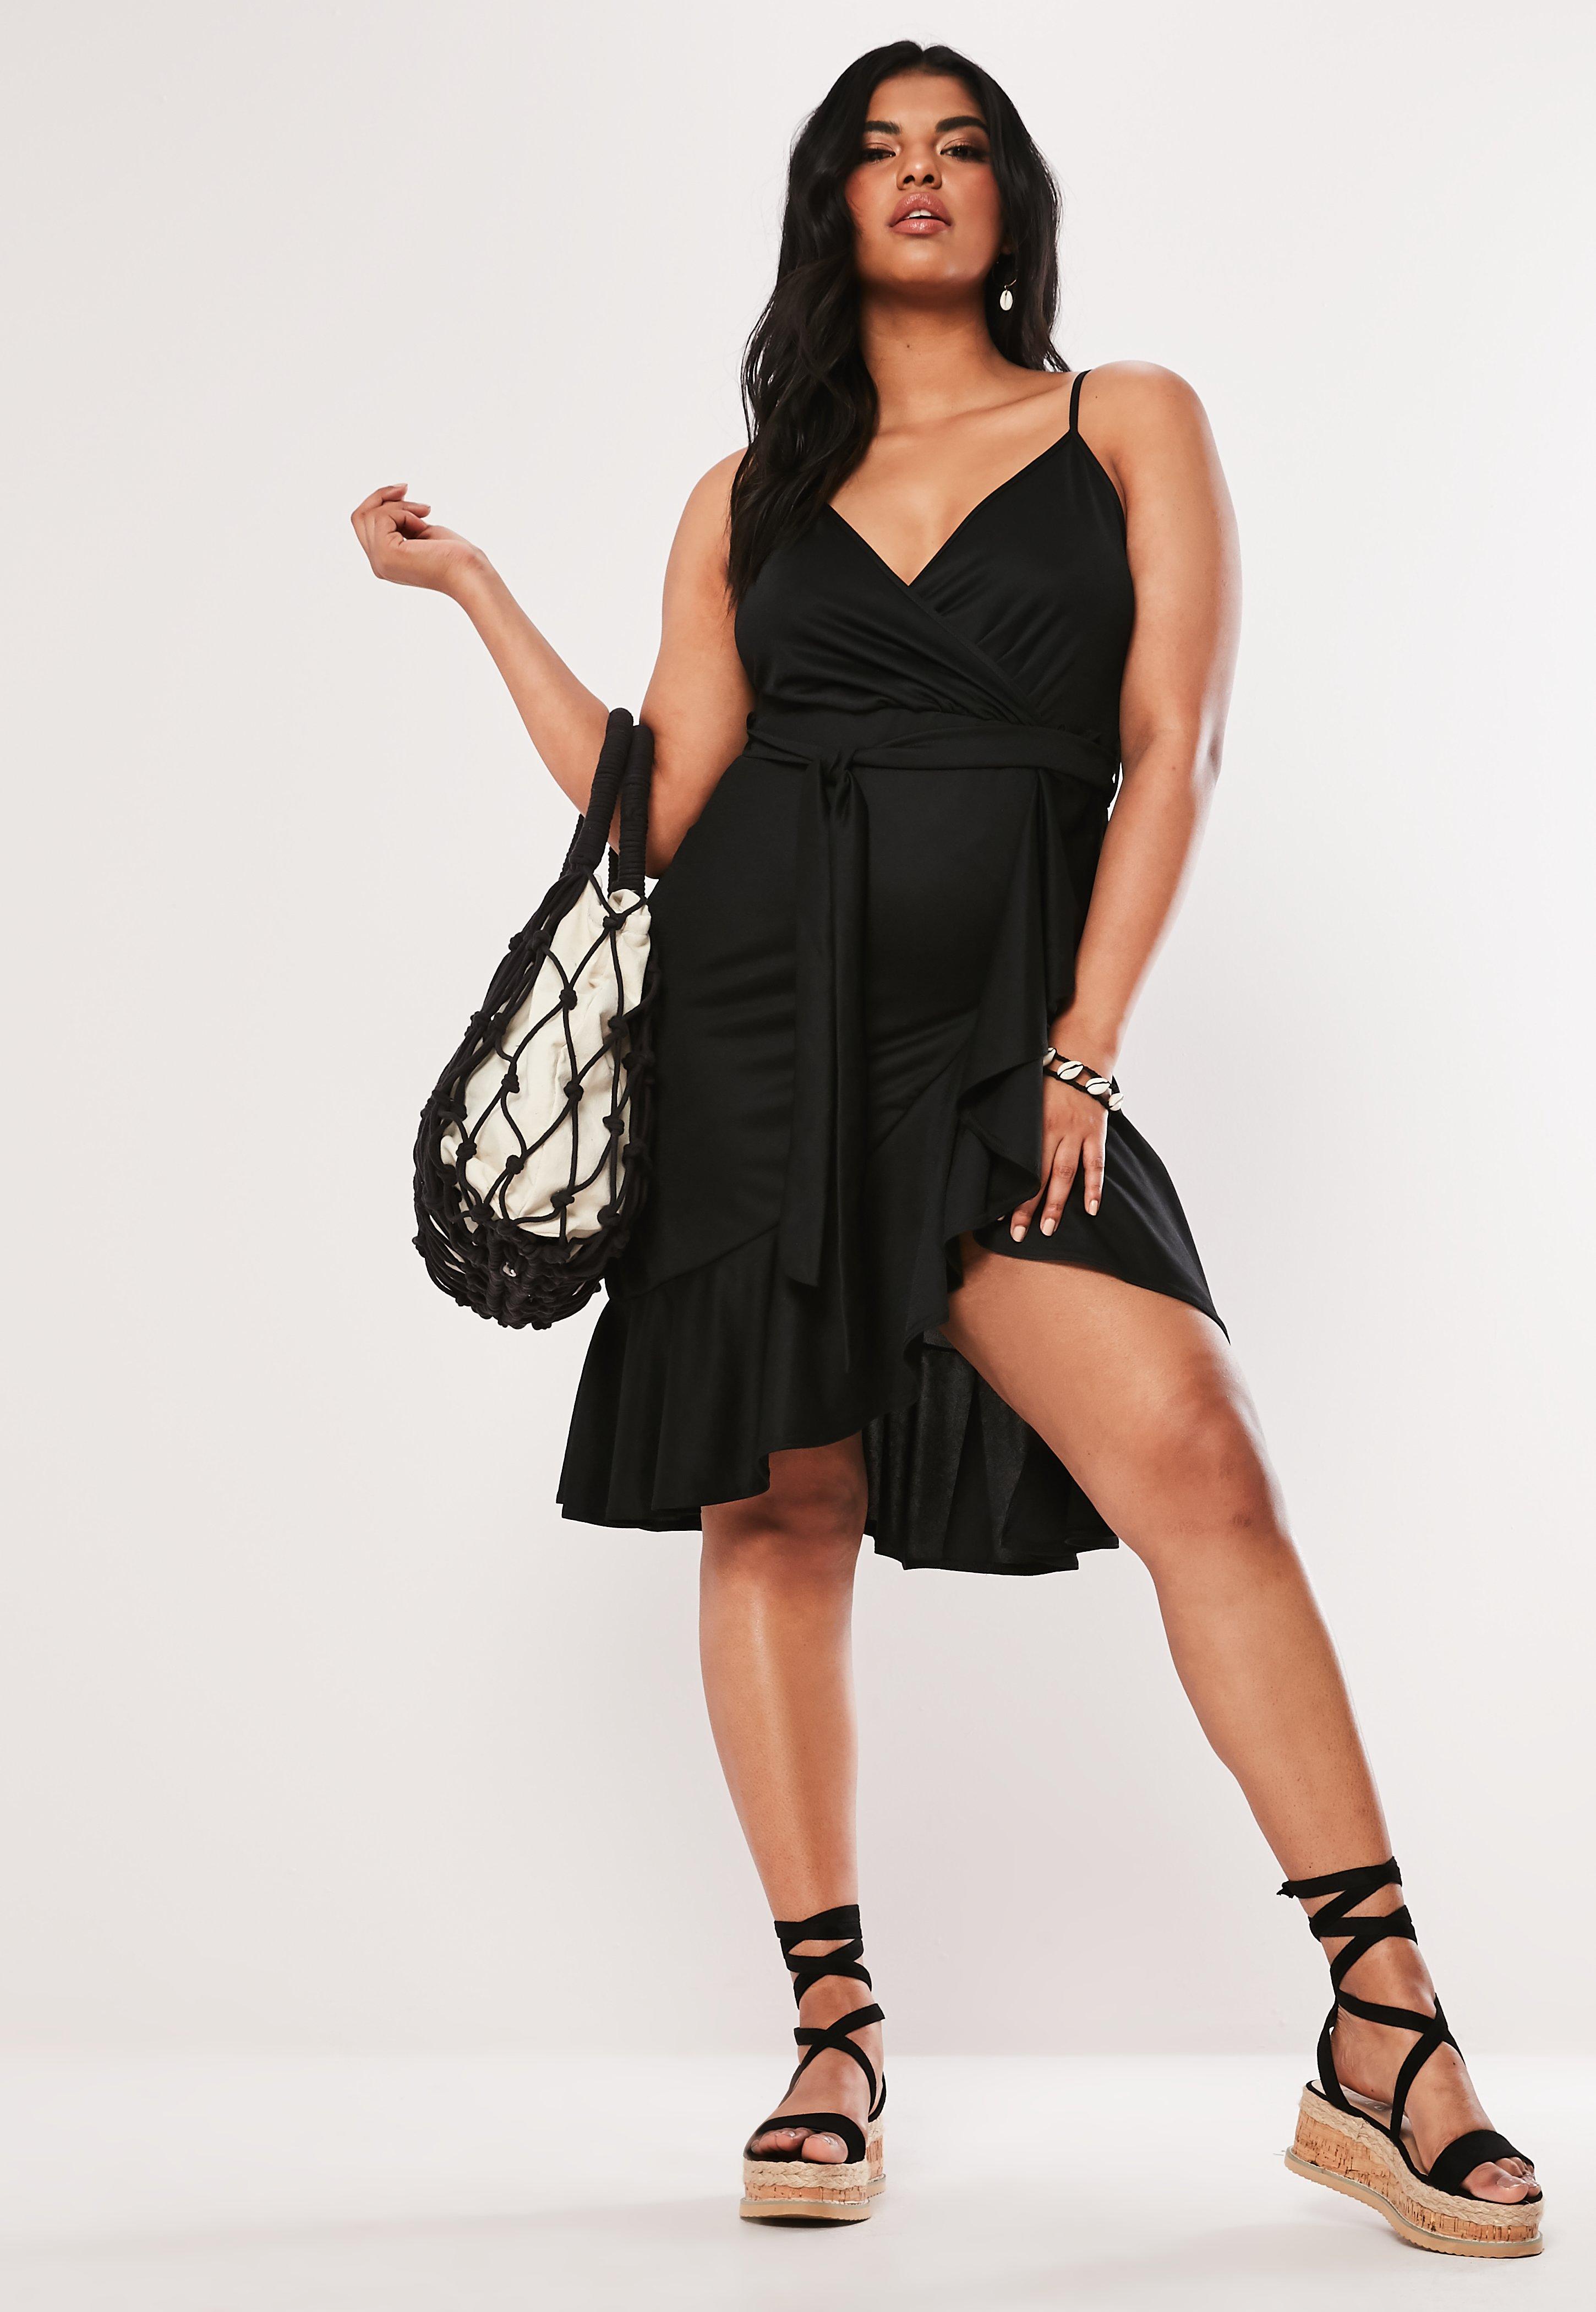 bf248761f7f Plus Size Dresses UK